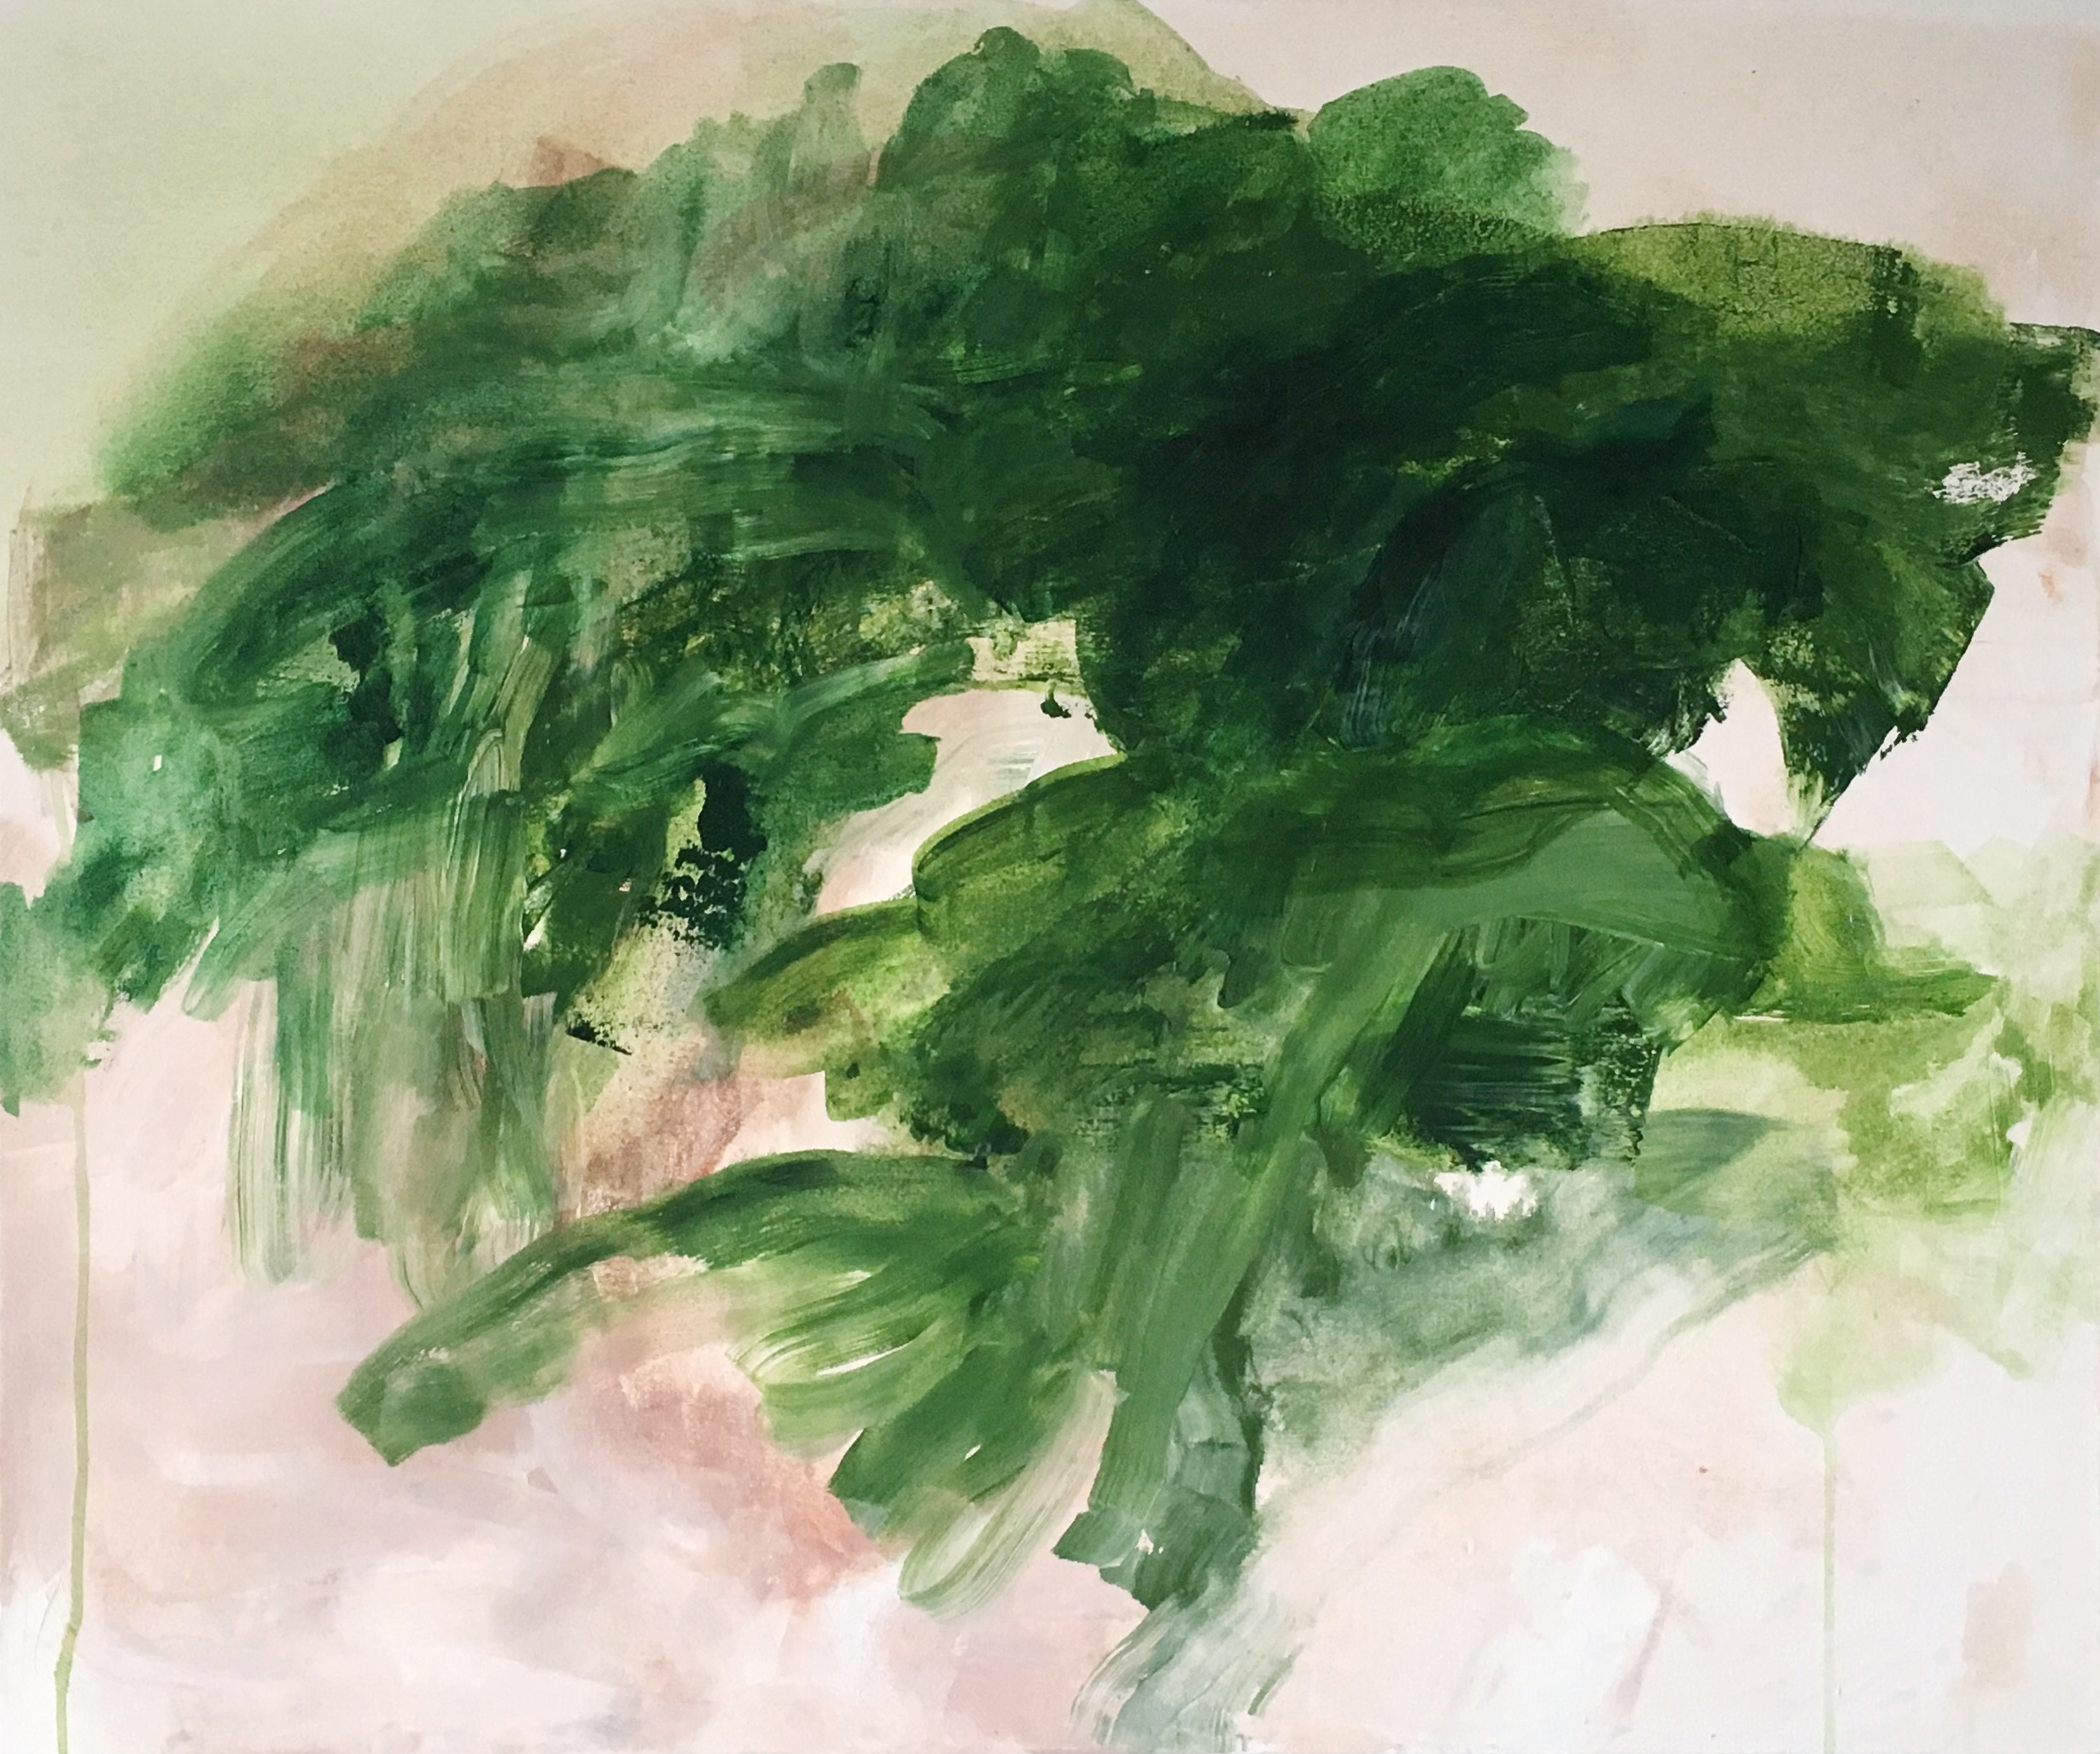 "We Never Left , acrylic on canvas, 36 x 30"", 2017"